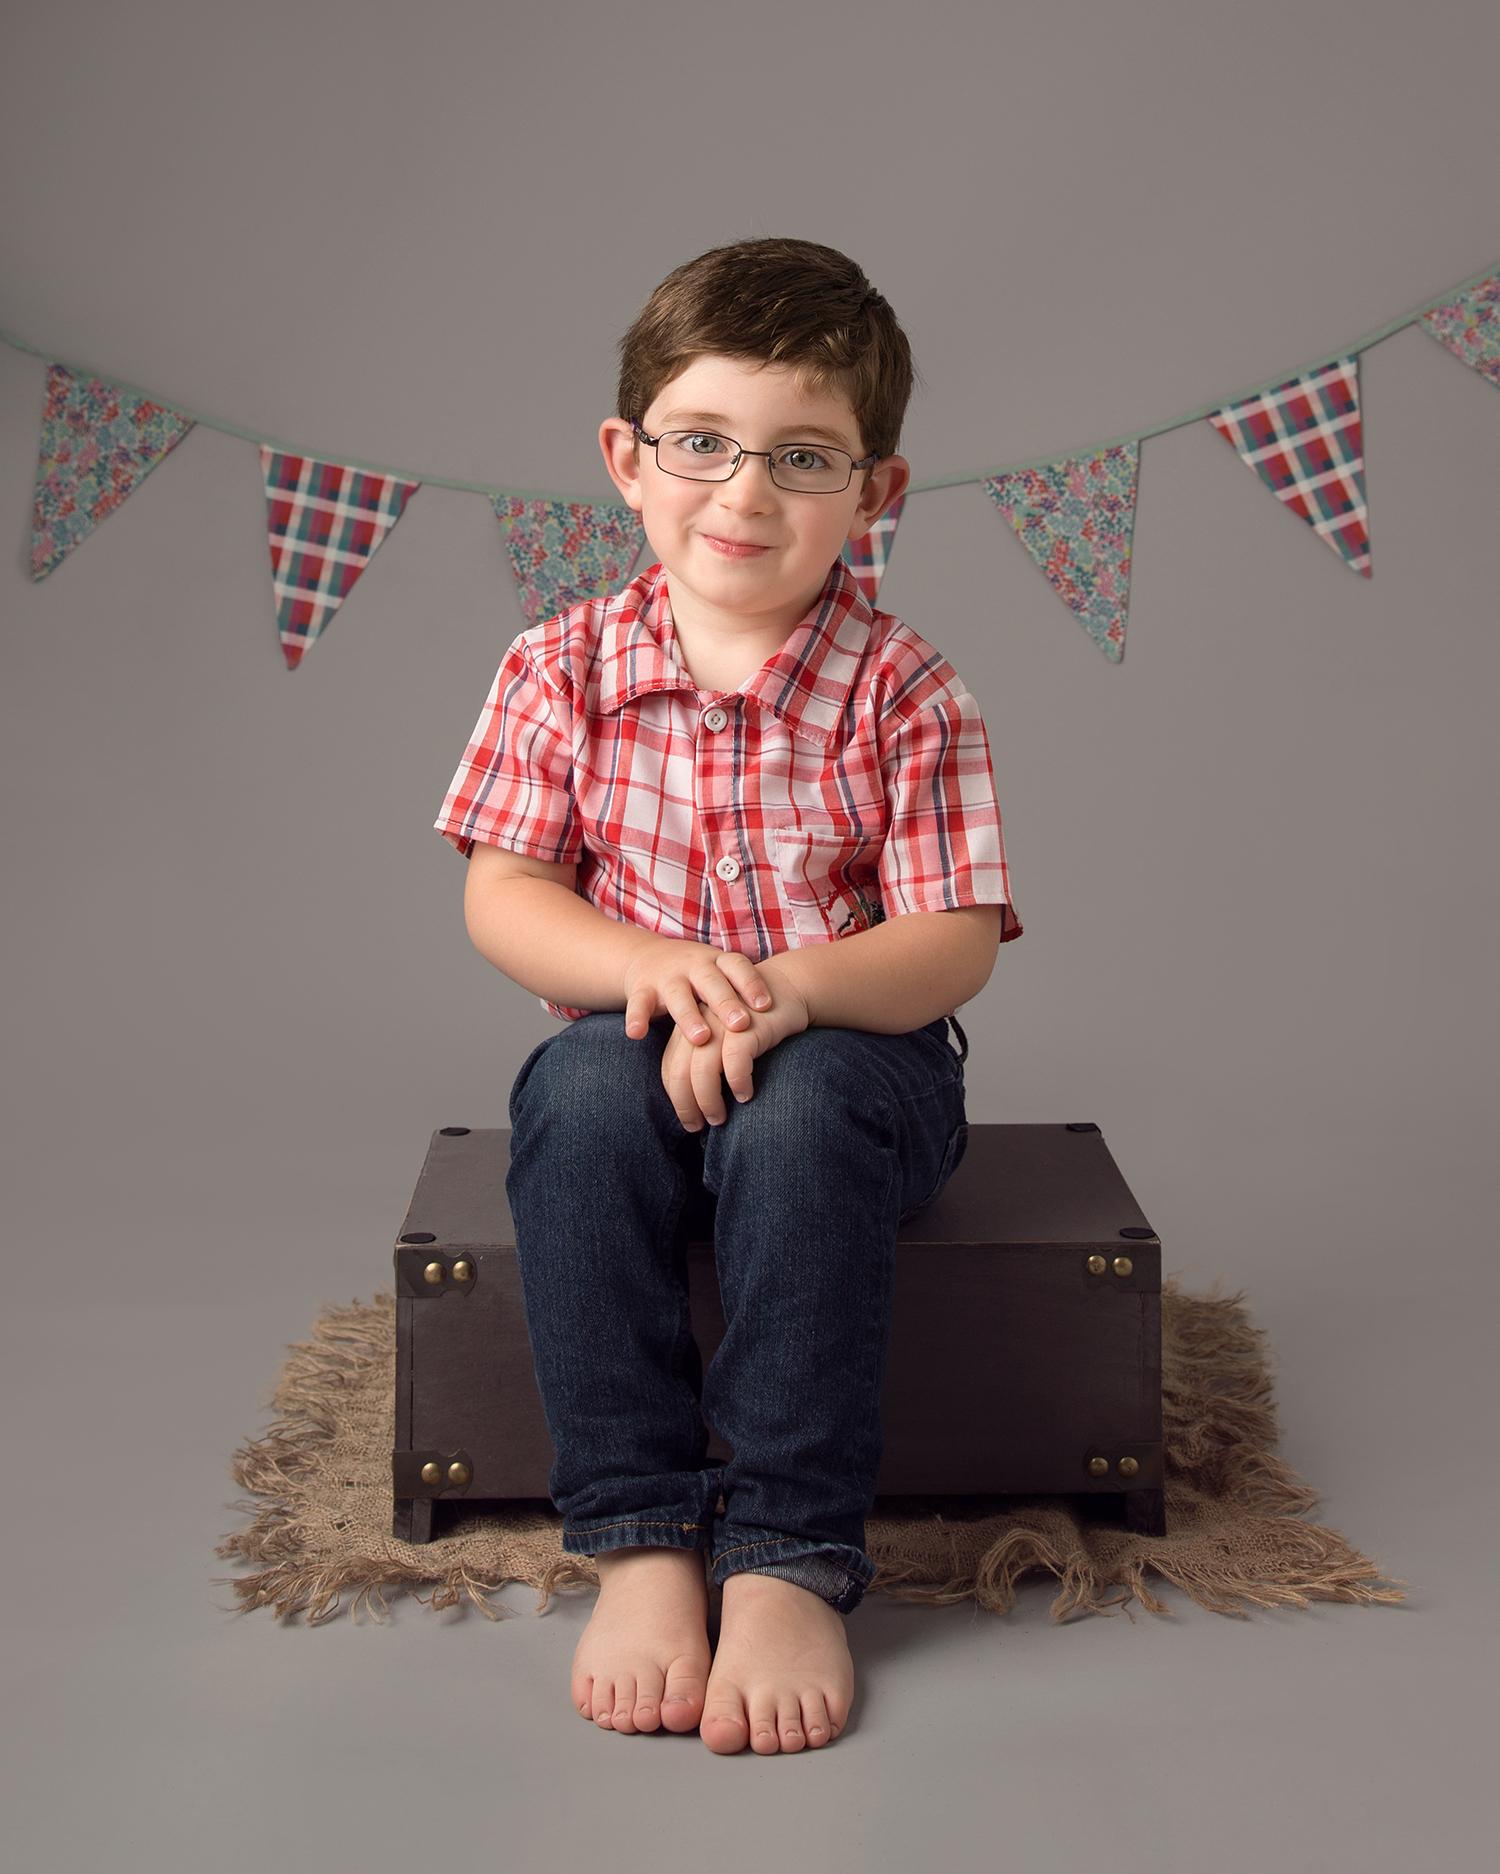 Childrens photographer Elisabeth Franco Photography